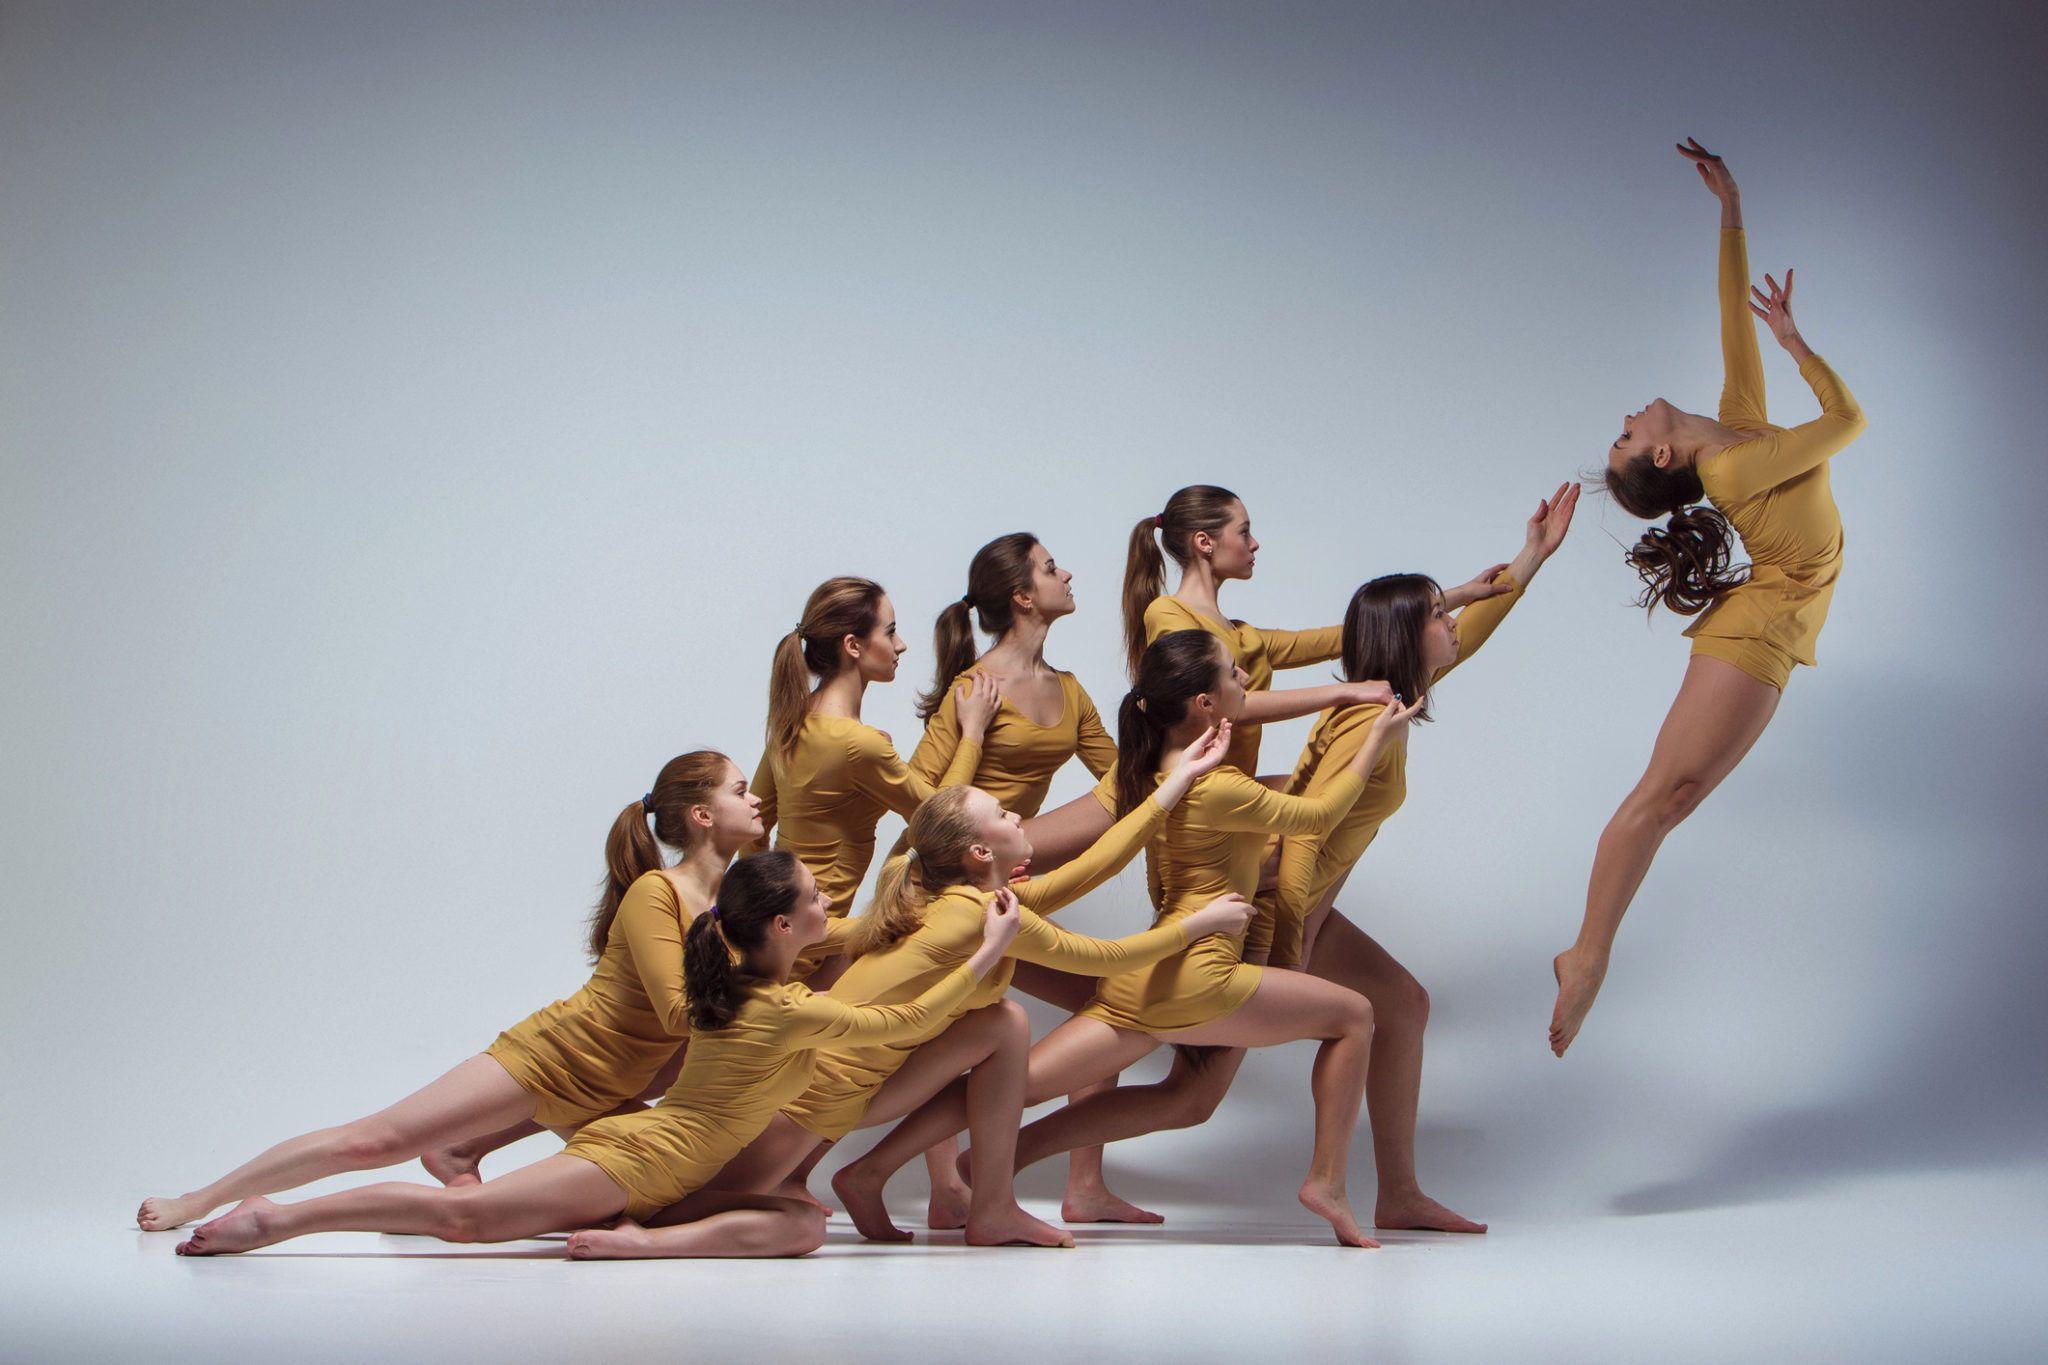 Contemporary Dance Captions For Instagram